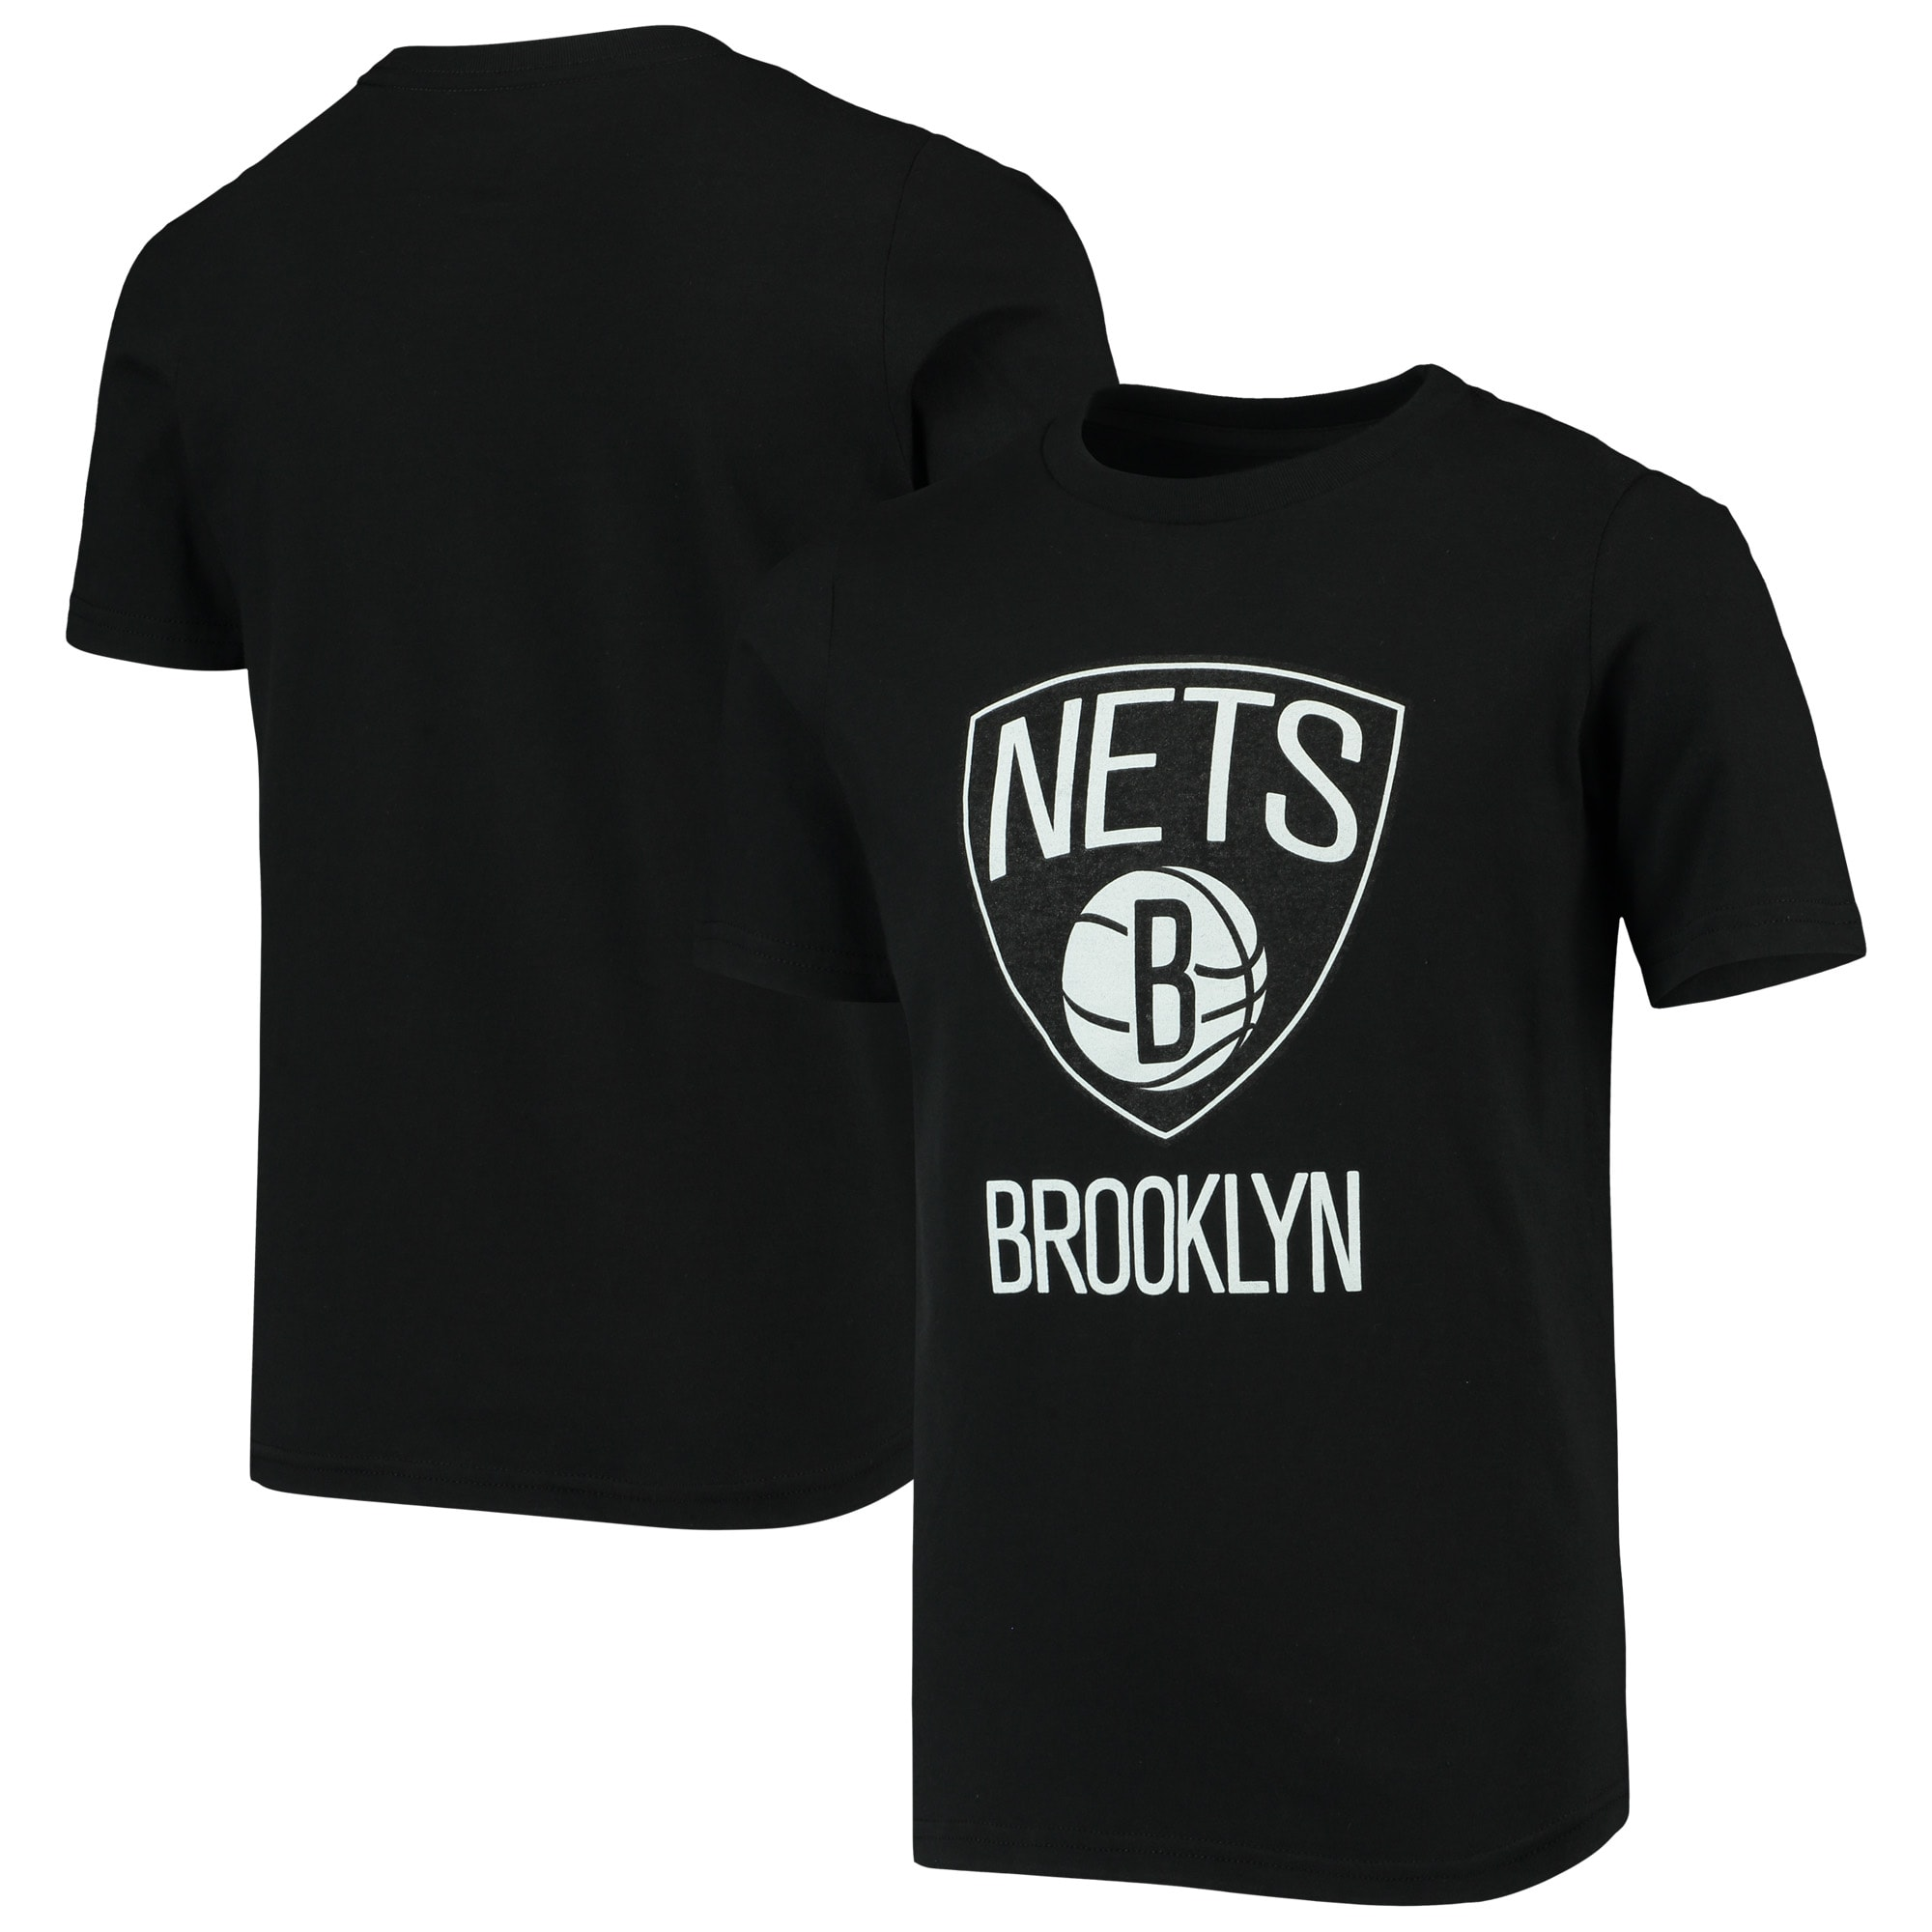 Brooklyn Nets Youth Primary Logo T-Shirt - Black